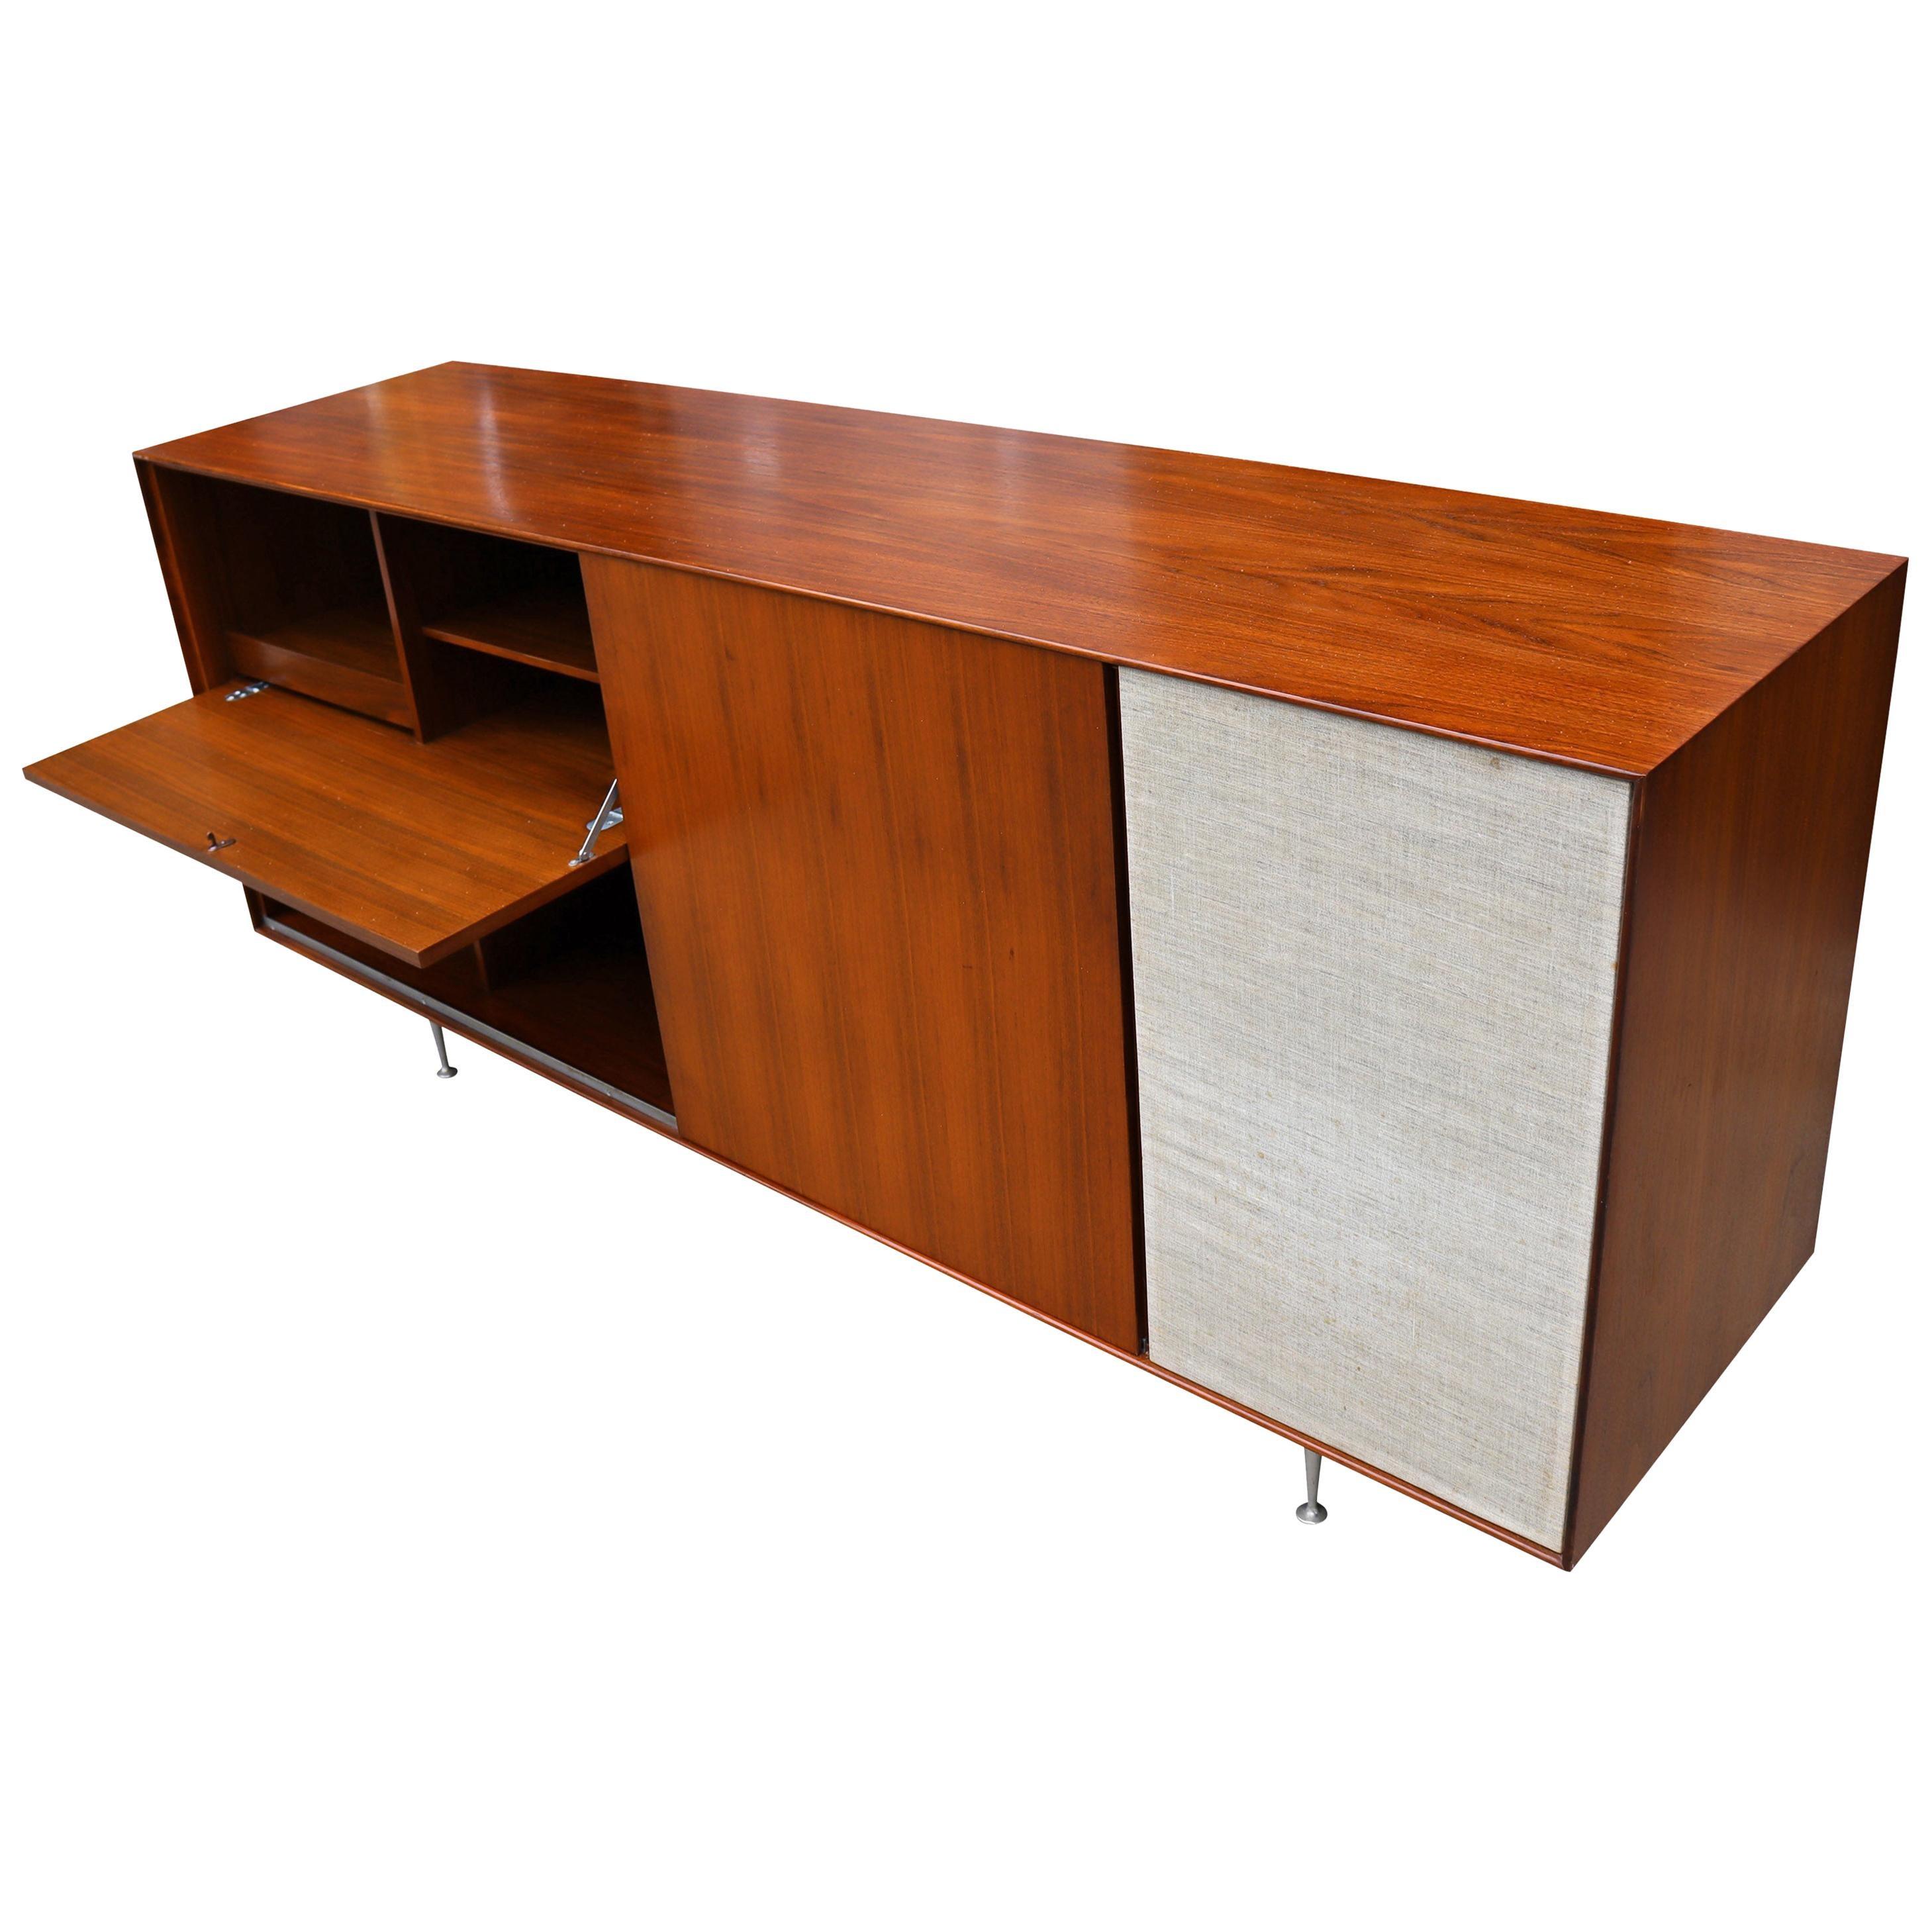 Midcentury George Nelson Hifi Cabinet Thin Edge for Herman Miller